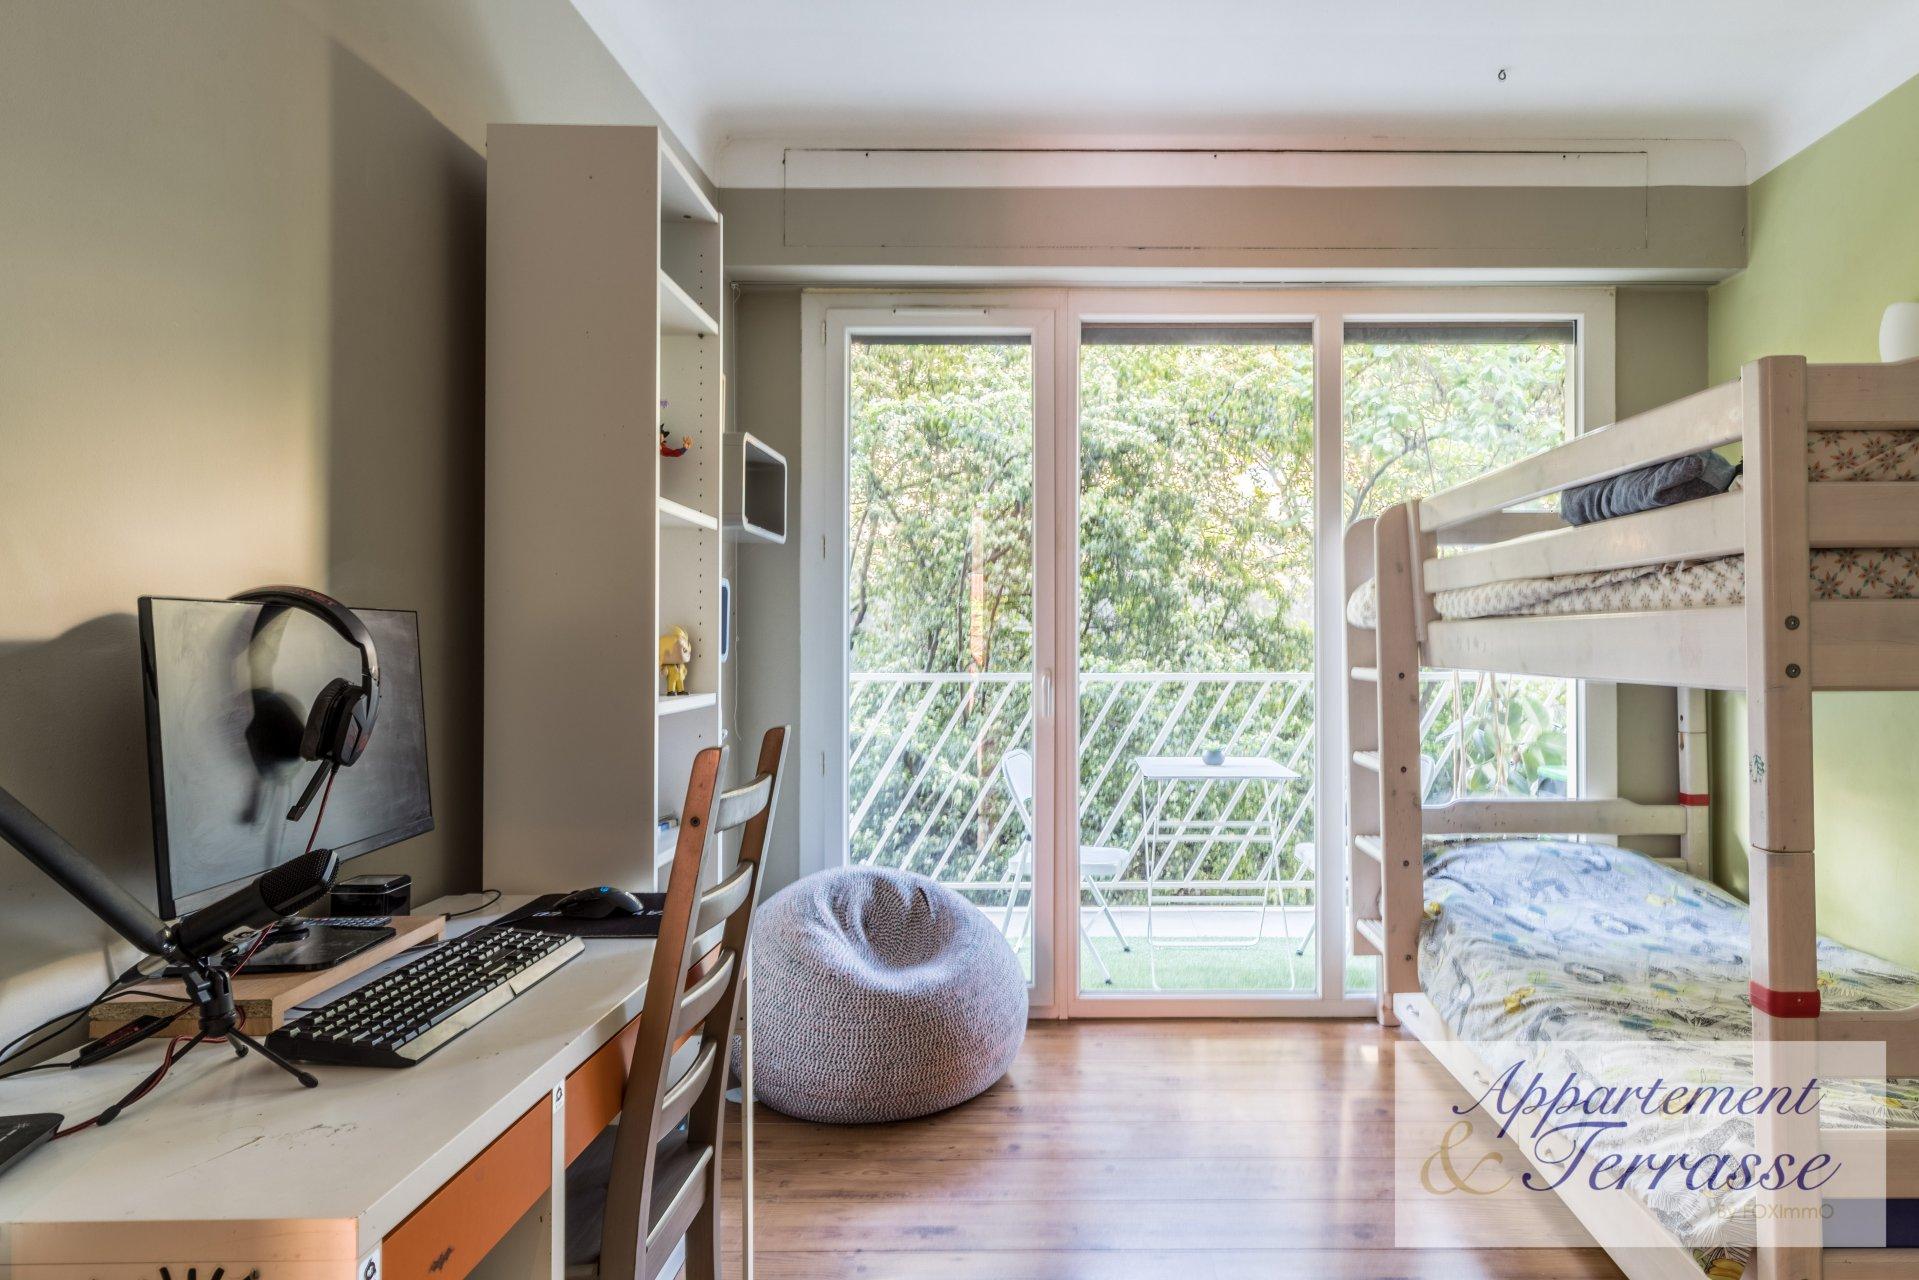 Ванс - 3-комнатная квартира с террасой в тихом районе